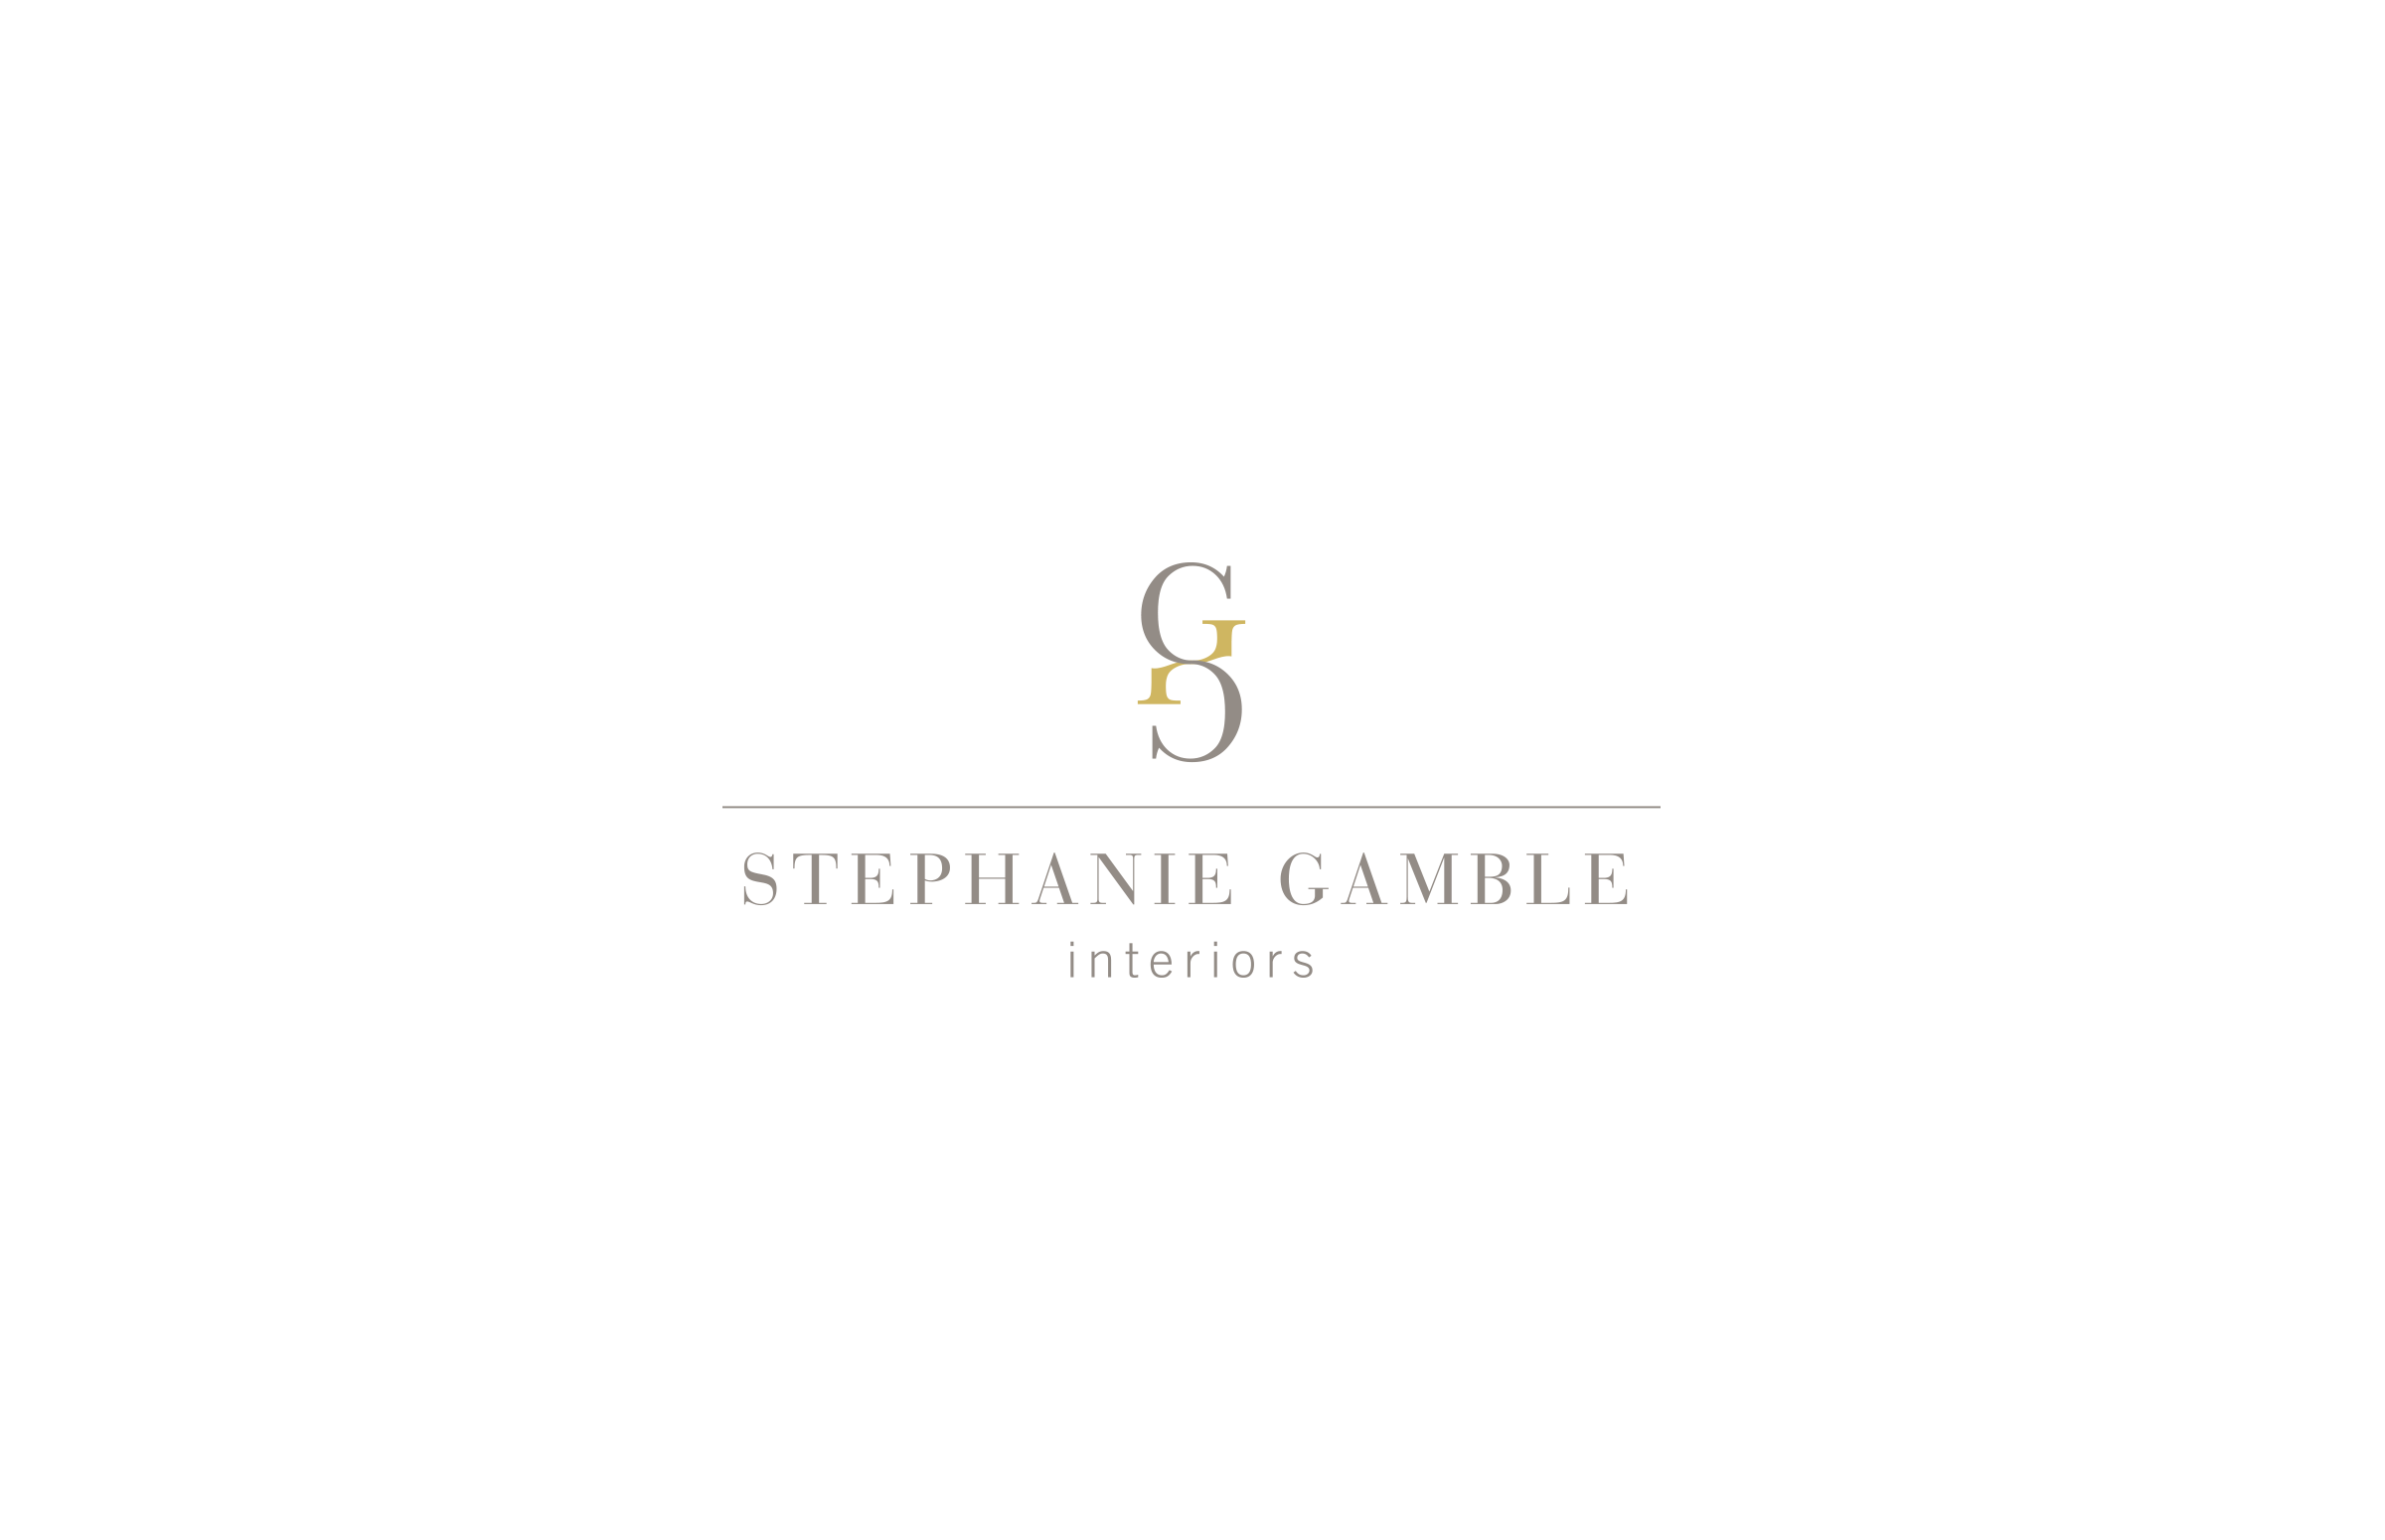 Stephanie Gamble Interiors